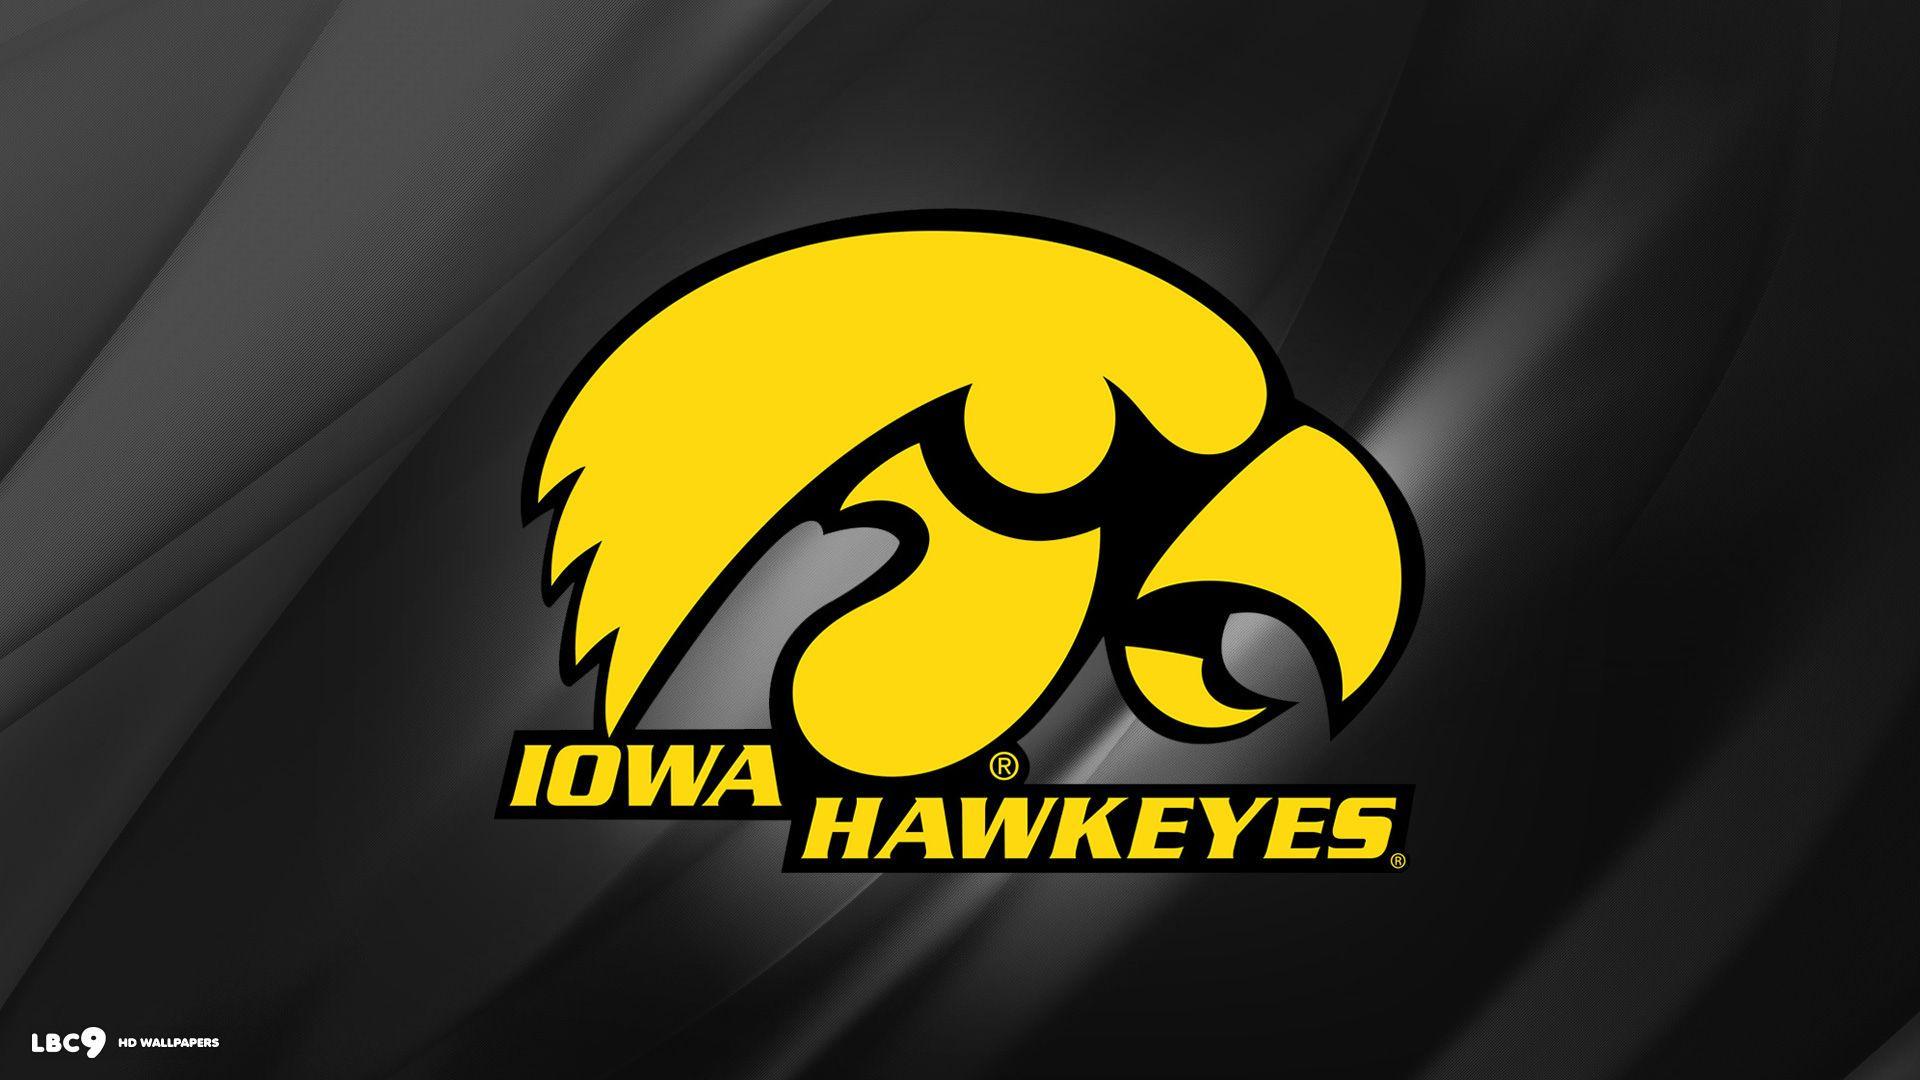 iowa hawkeyes wallpaper 23 college athletics hd backgrounds 1920x1080